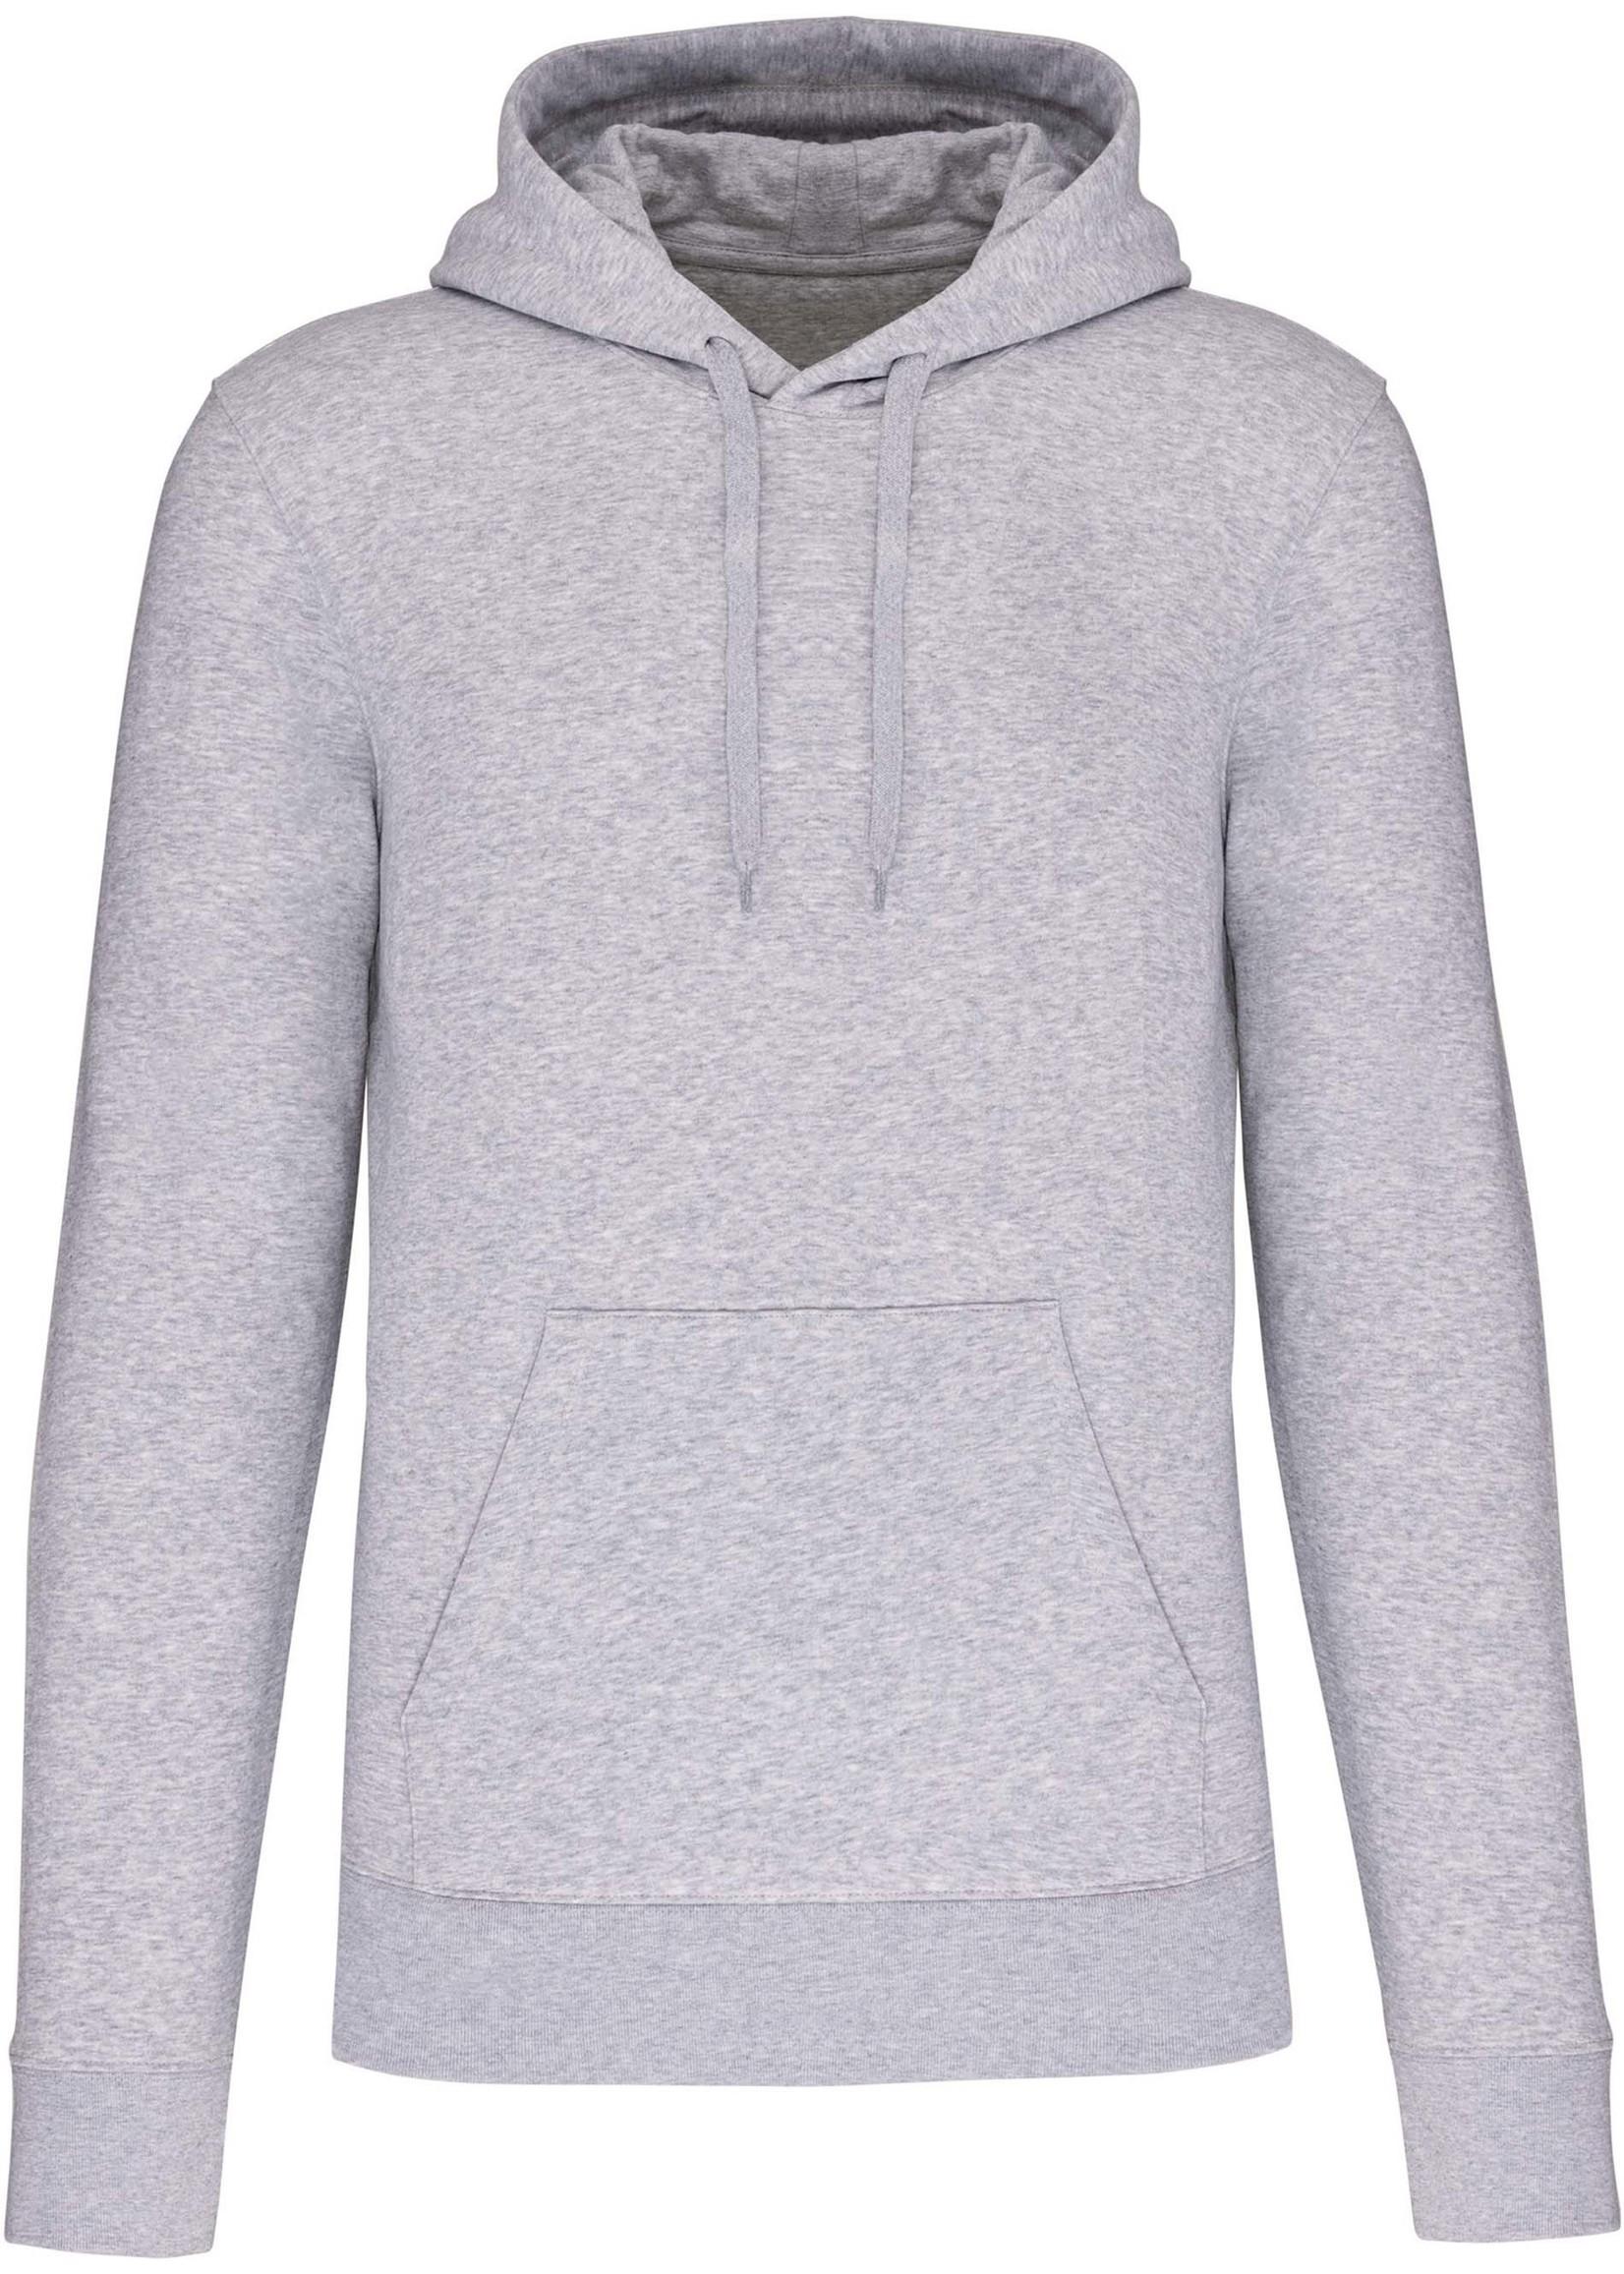 Eco-Friendly Hoodie Uni Oxford-Grey